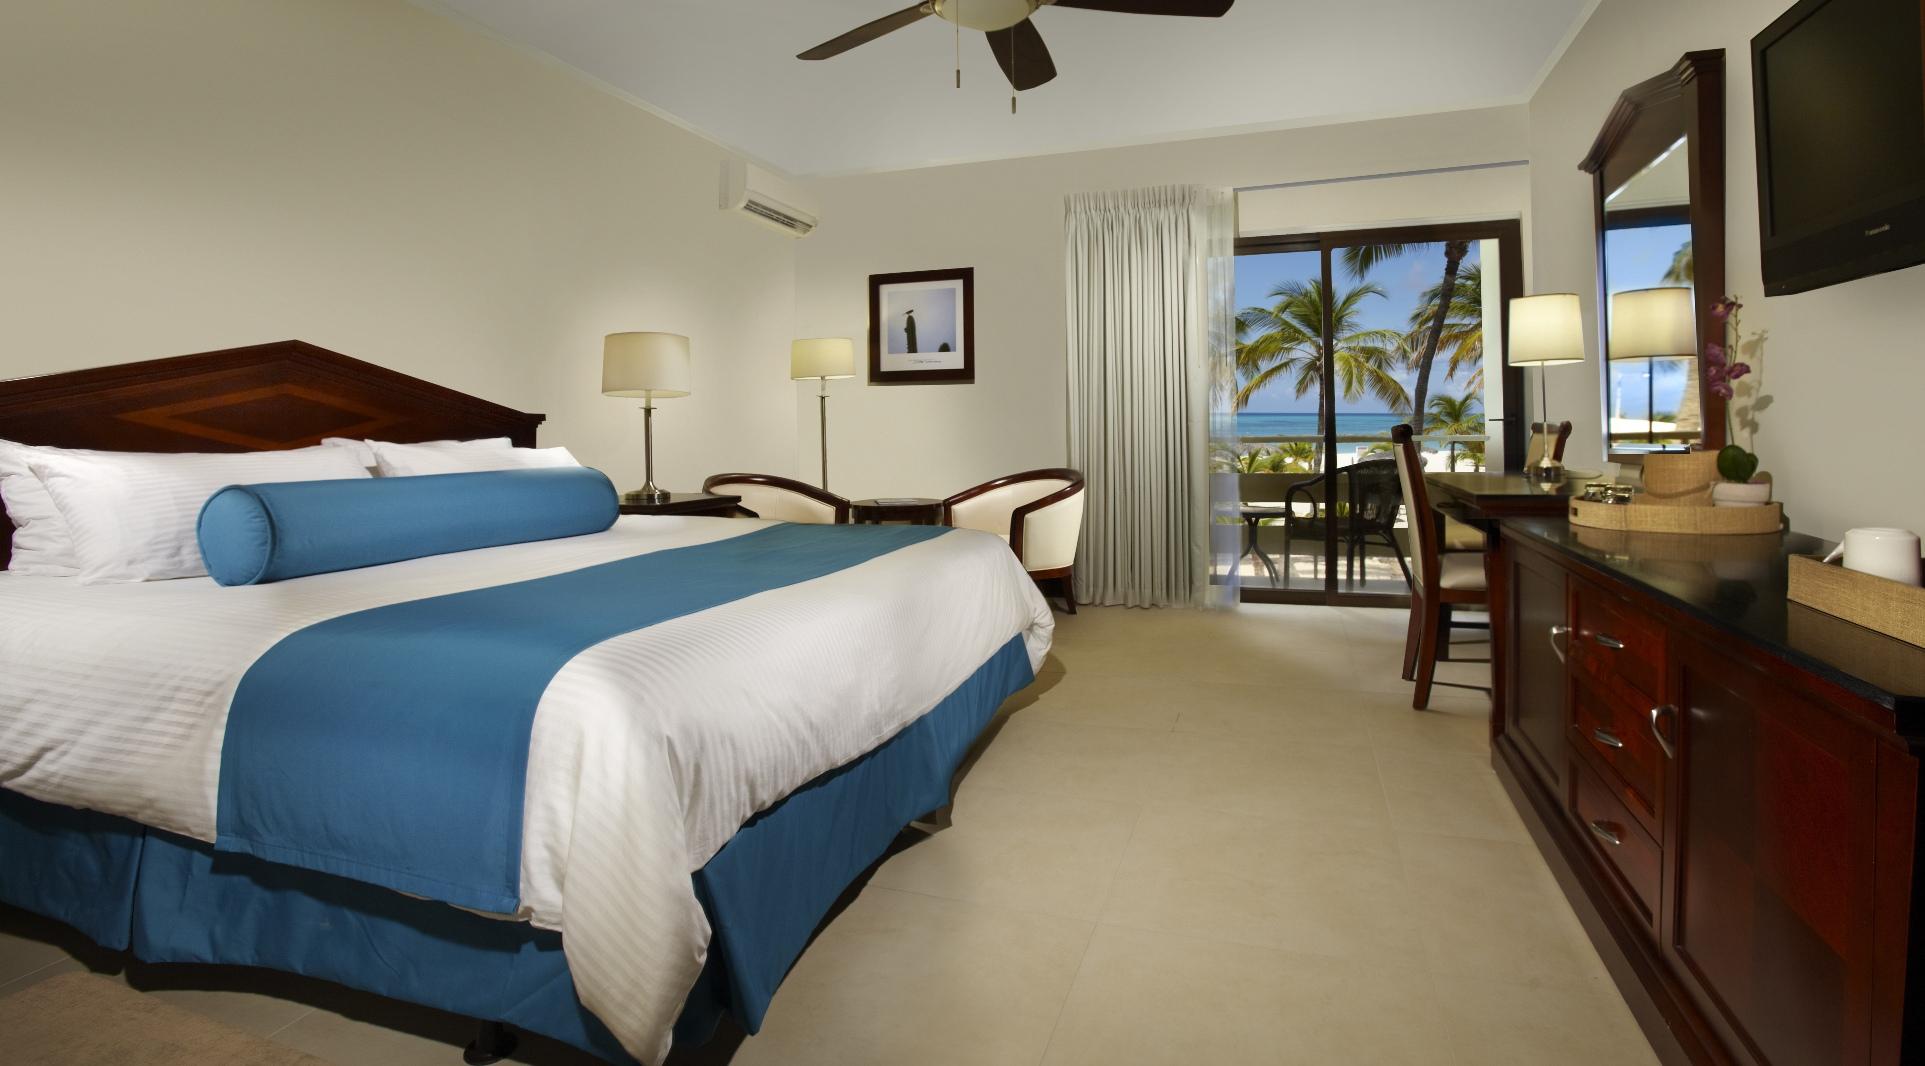 Aruba All Inclusive >> Boutique Resort Manchebo Beach Resort & Spa on Aruba Introduces New Logo and Slogan